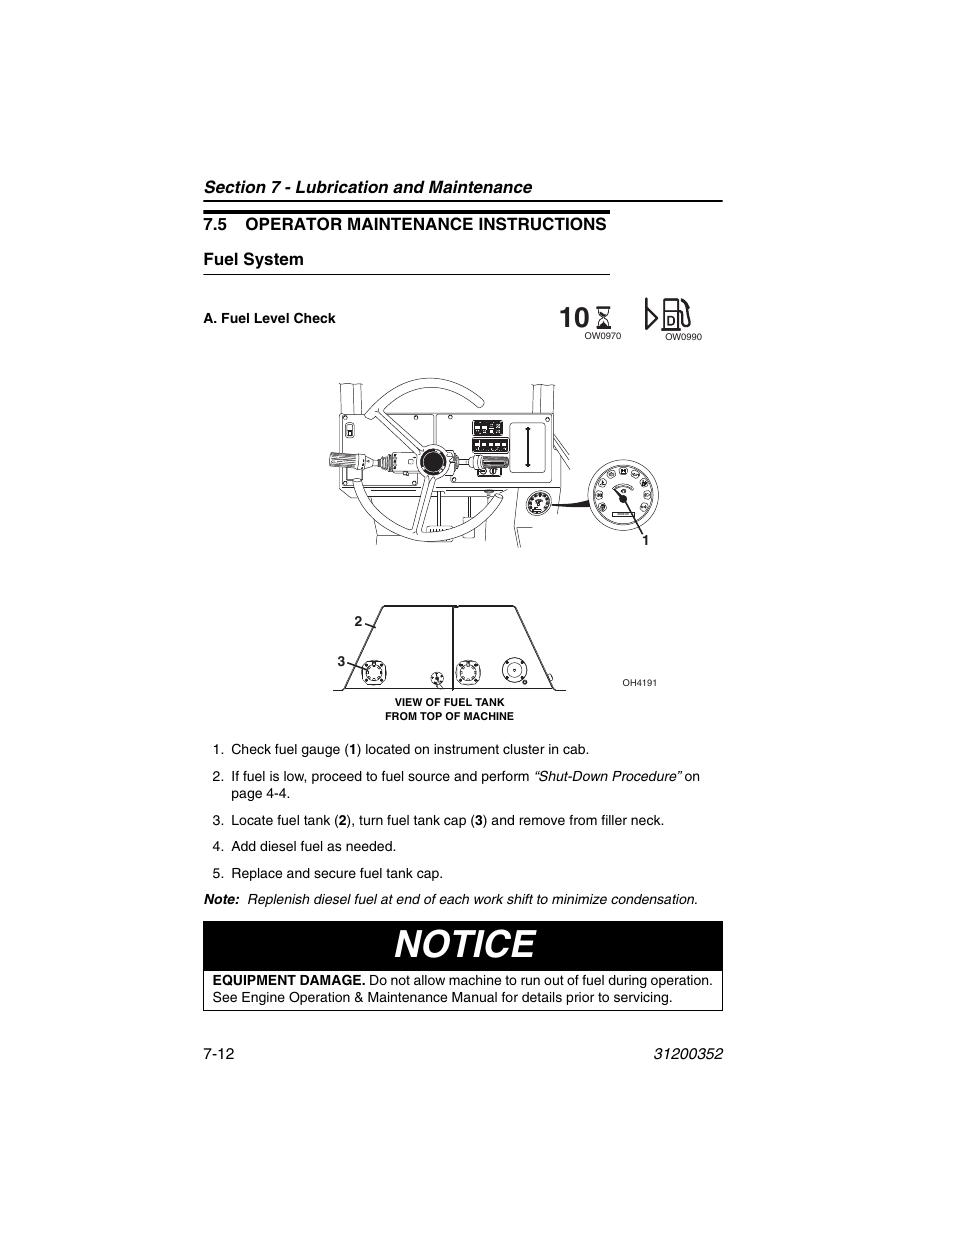 5 operator maintenance instructions, Fuel system, 5 operator